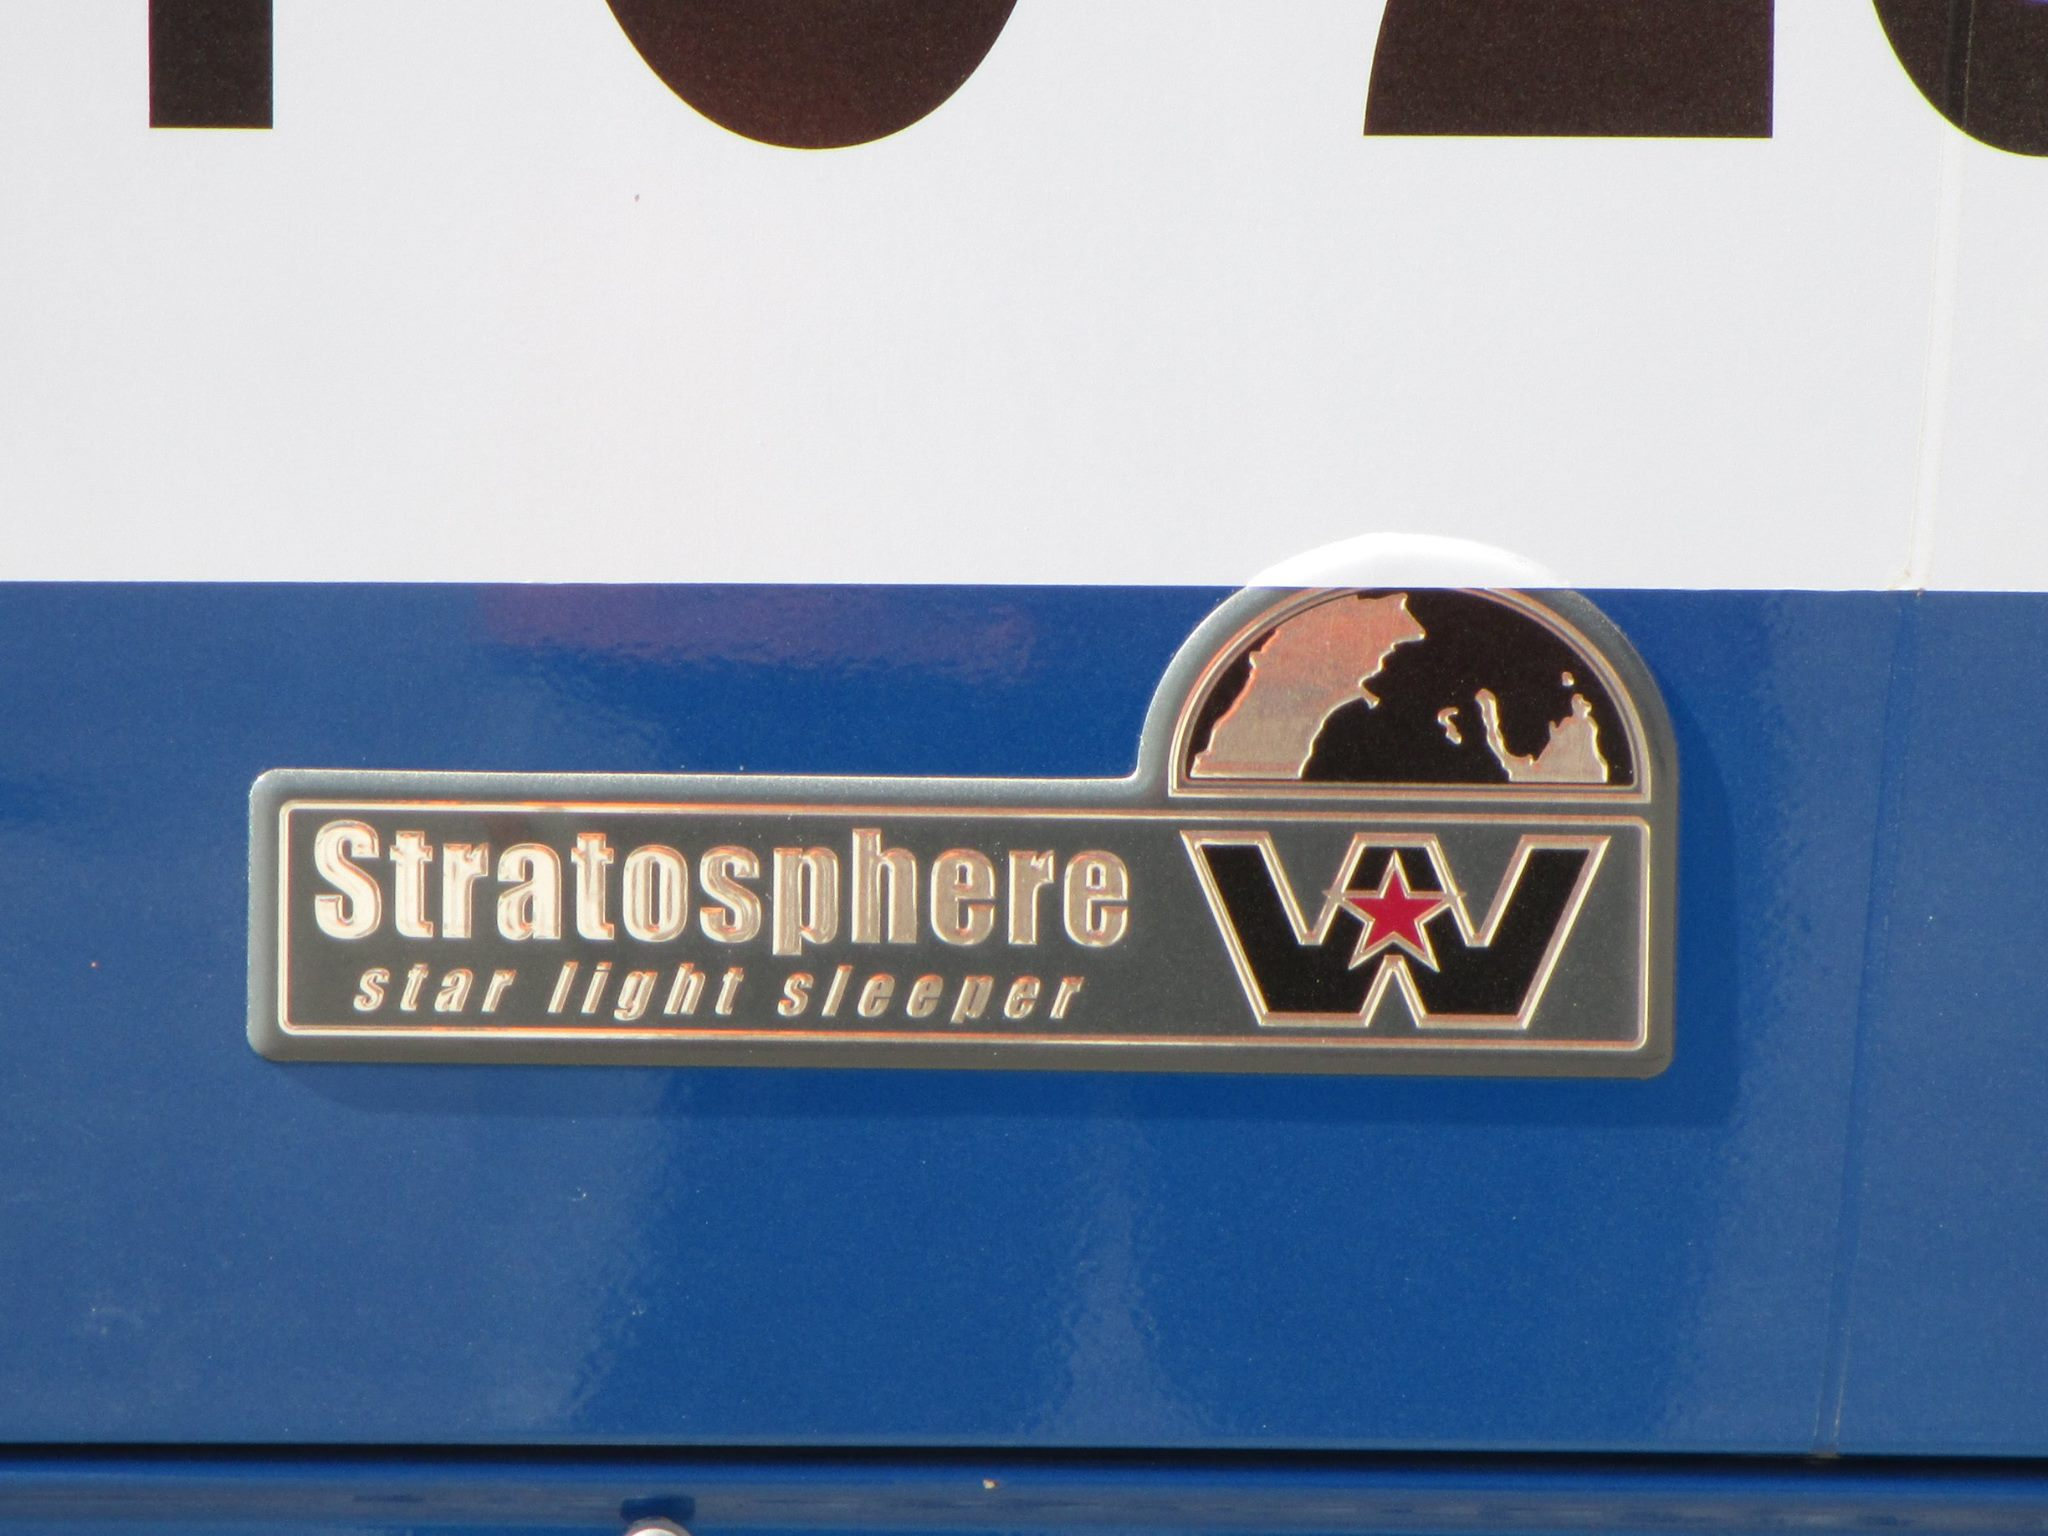 WESTERN-STAR-WS-4900-SA--SERVITRANSMART-2010-4